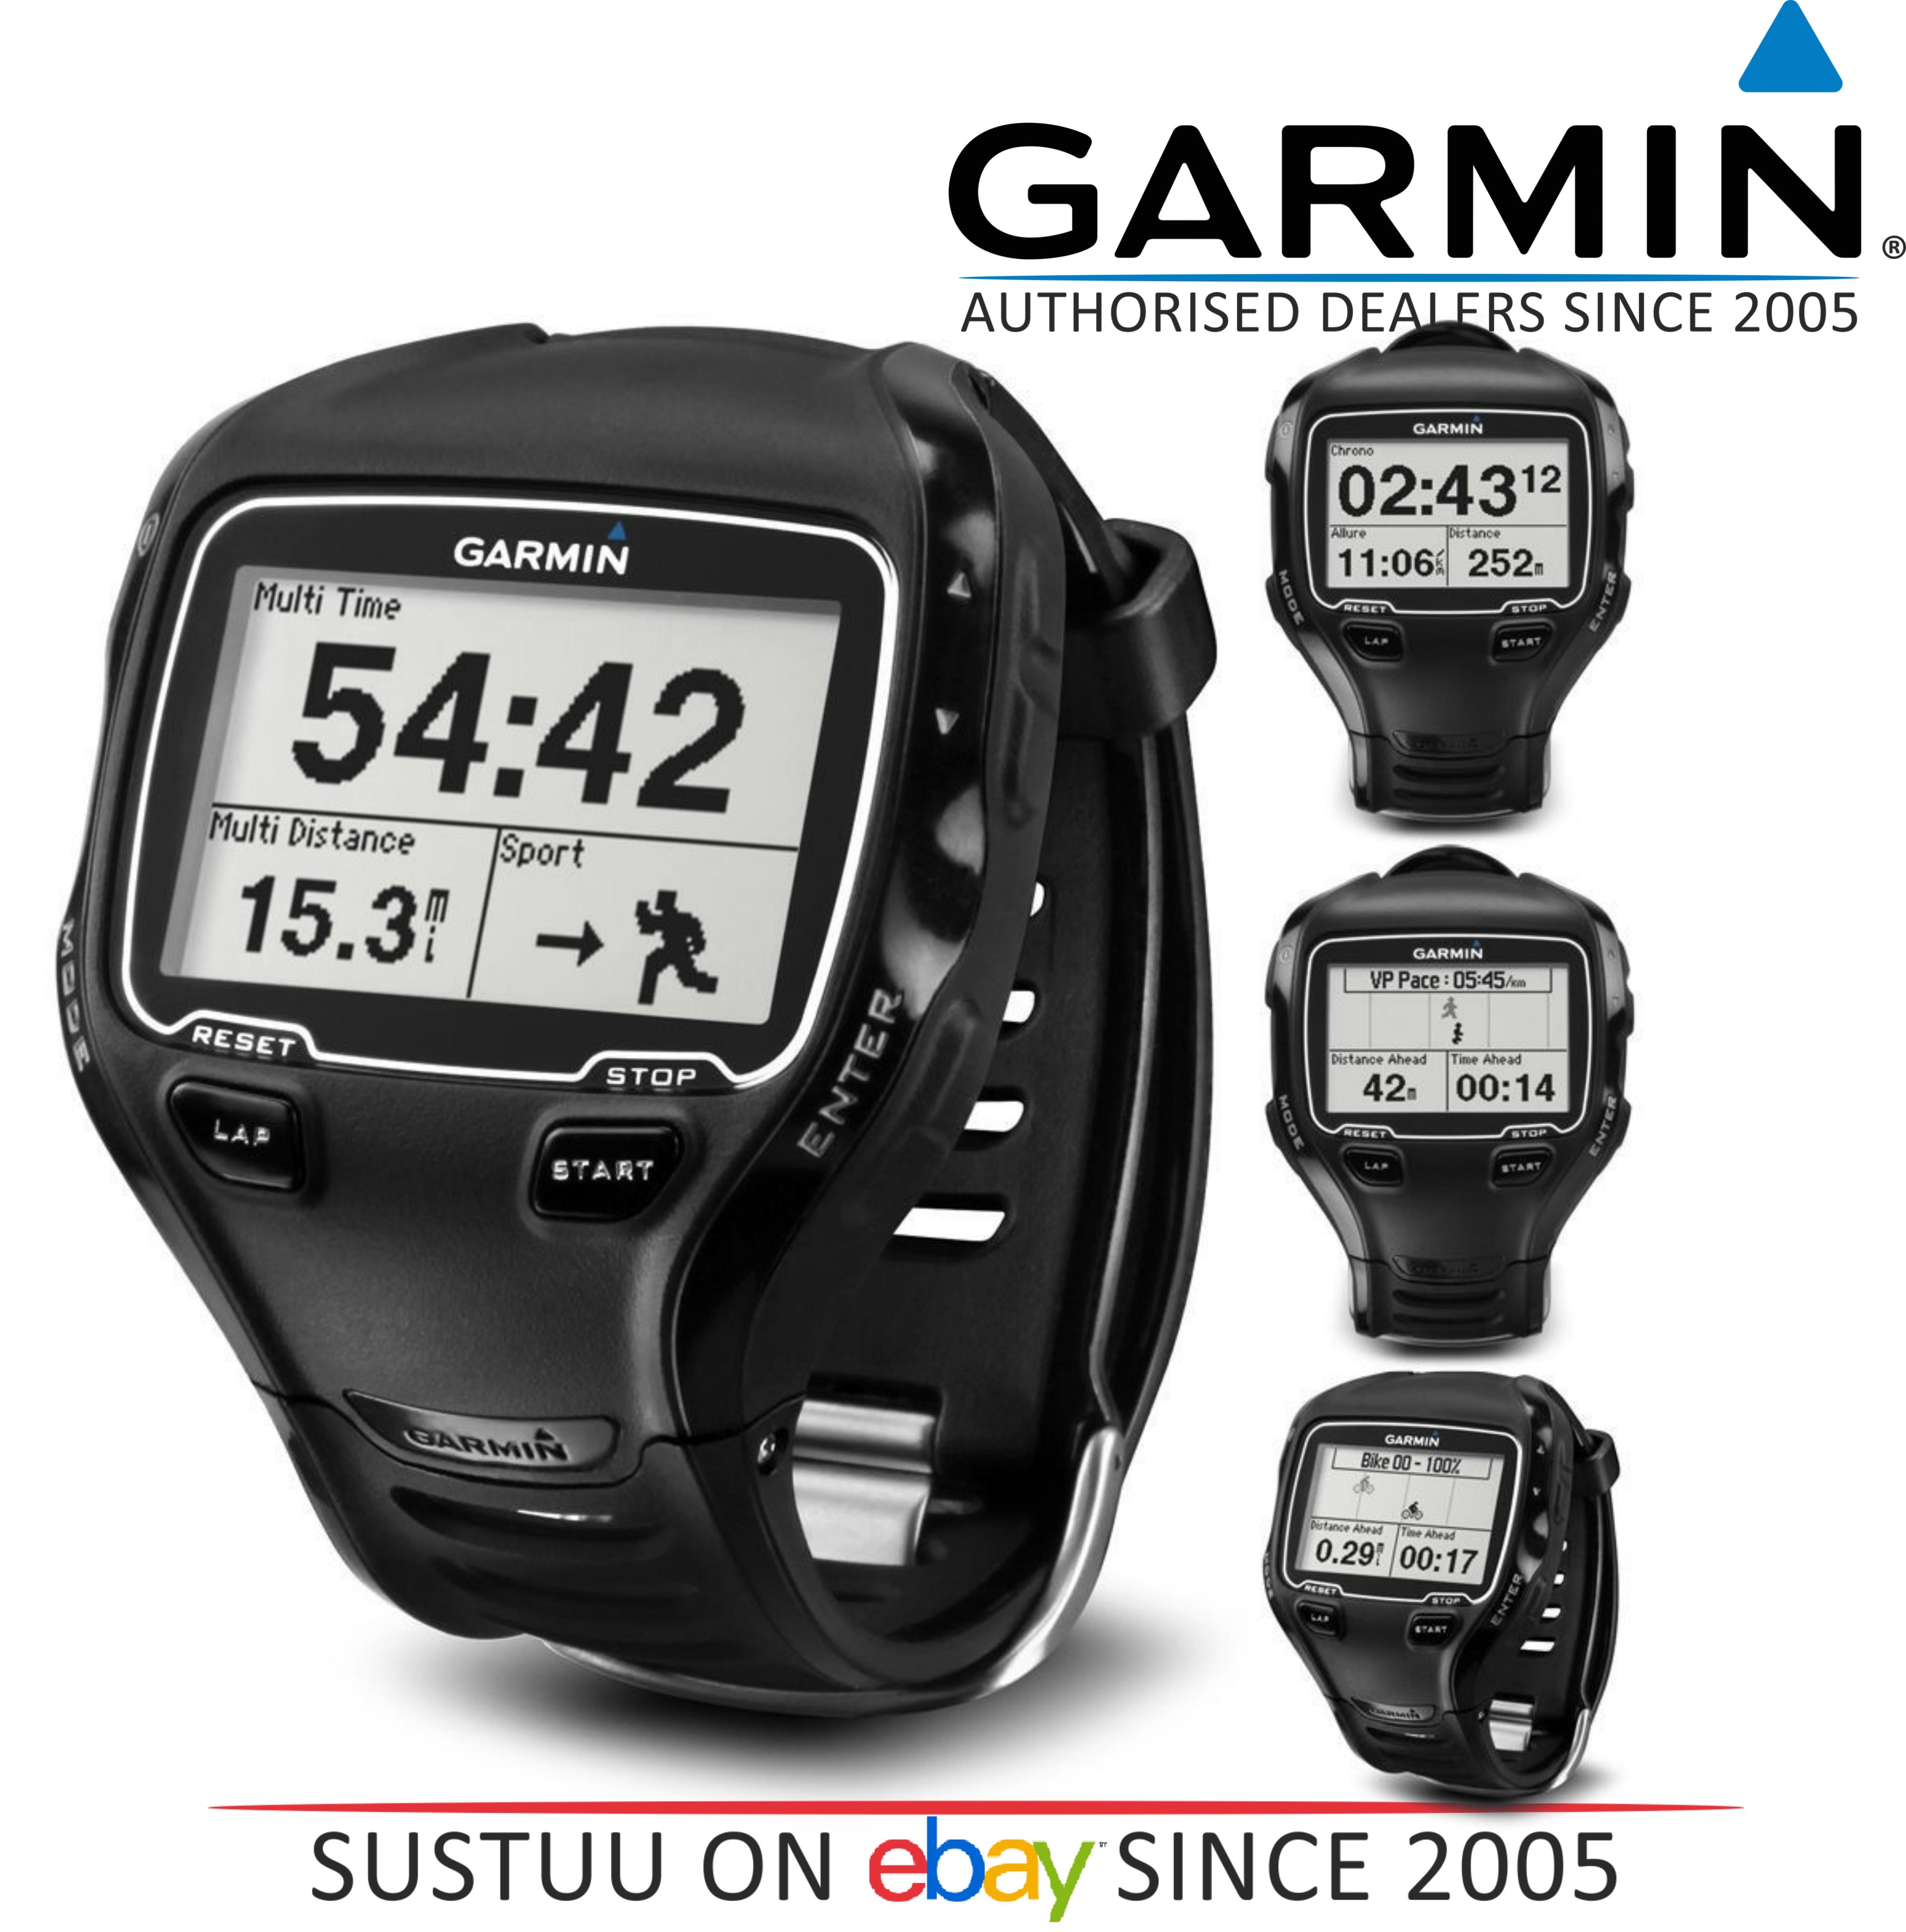 garmin forerunner 910xt gps triathlon running swim cycle. Black Bedroom Furniture Sets. Home Design Ideas